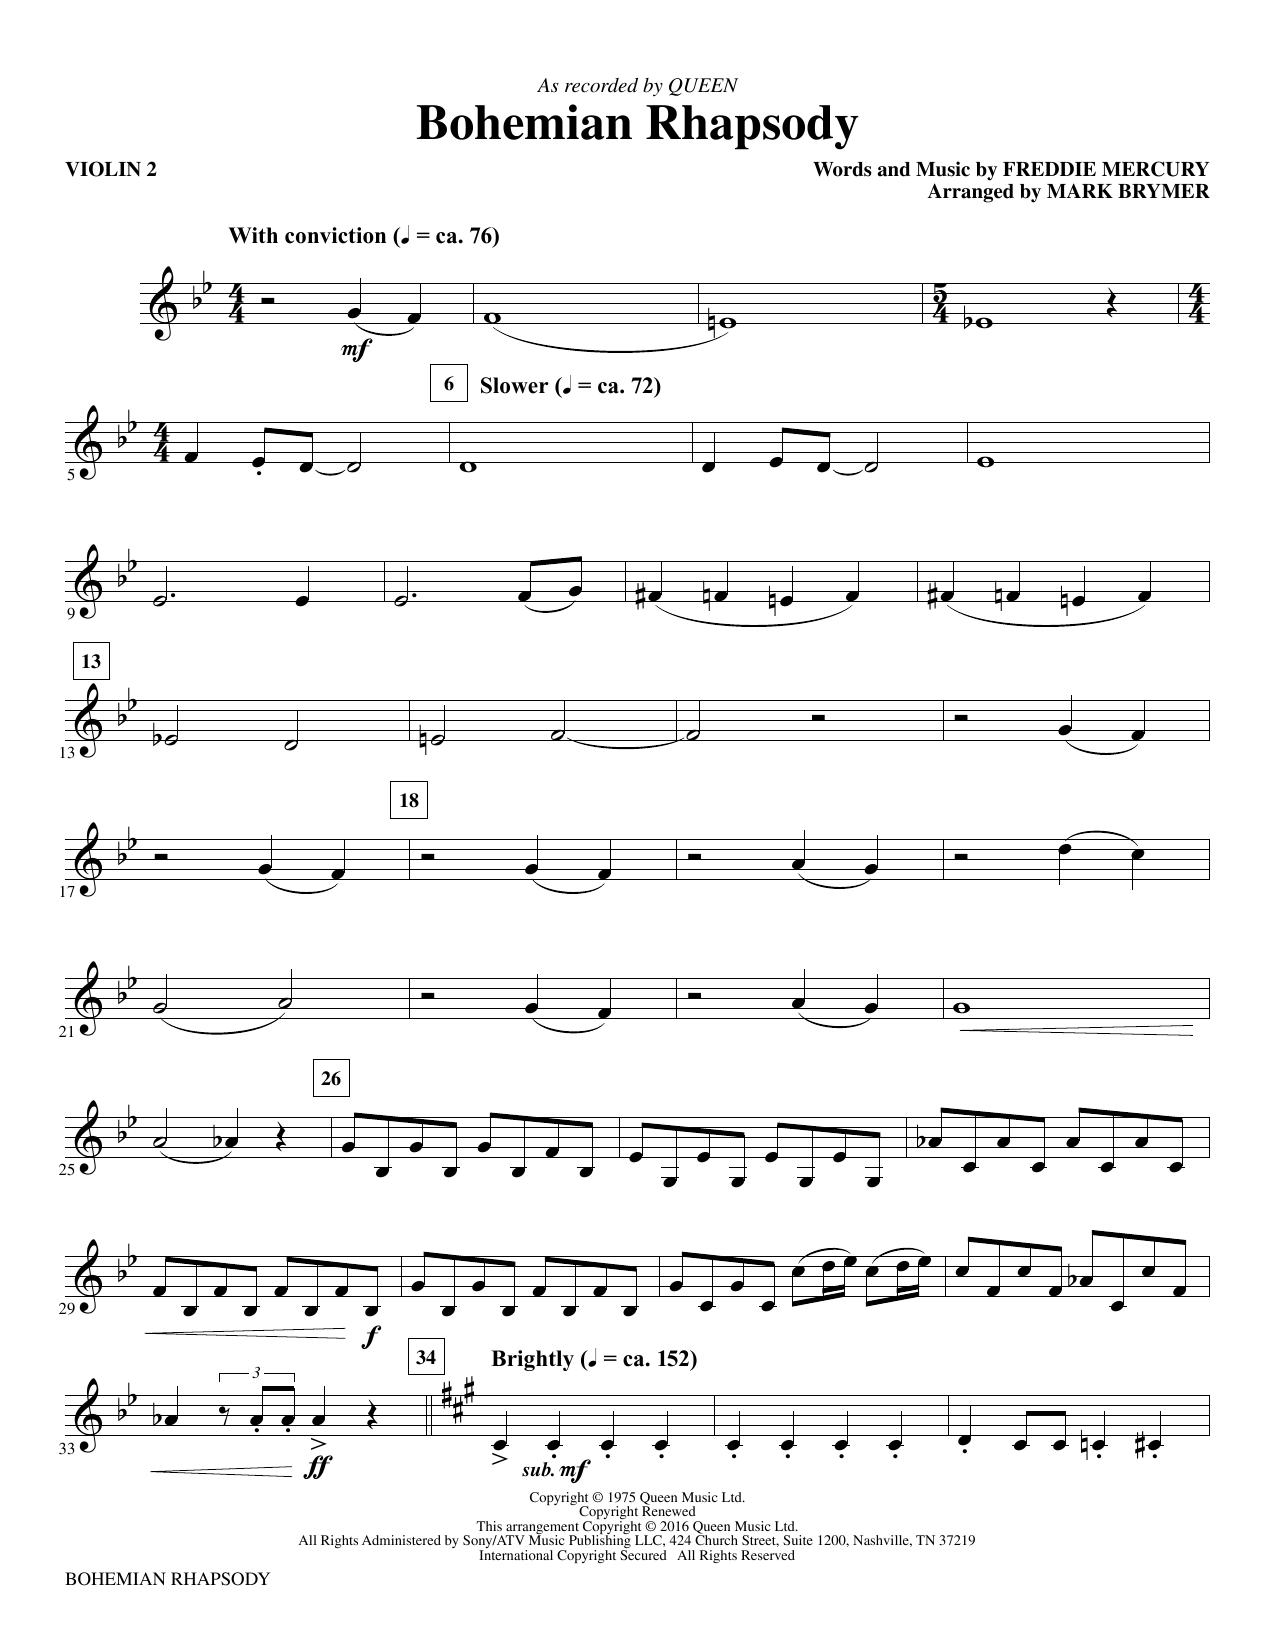 Bohemian Rhapsody - Violin 2 Sheet Music